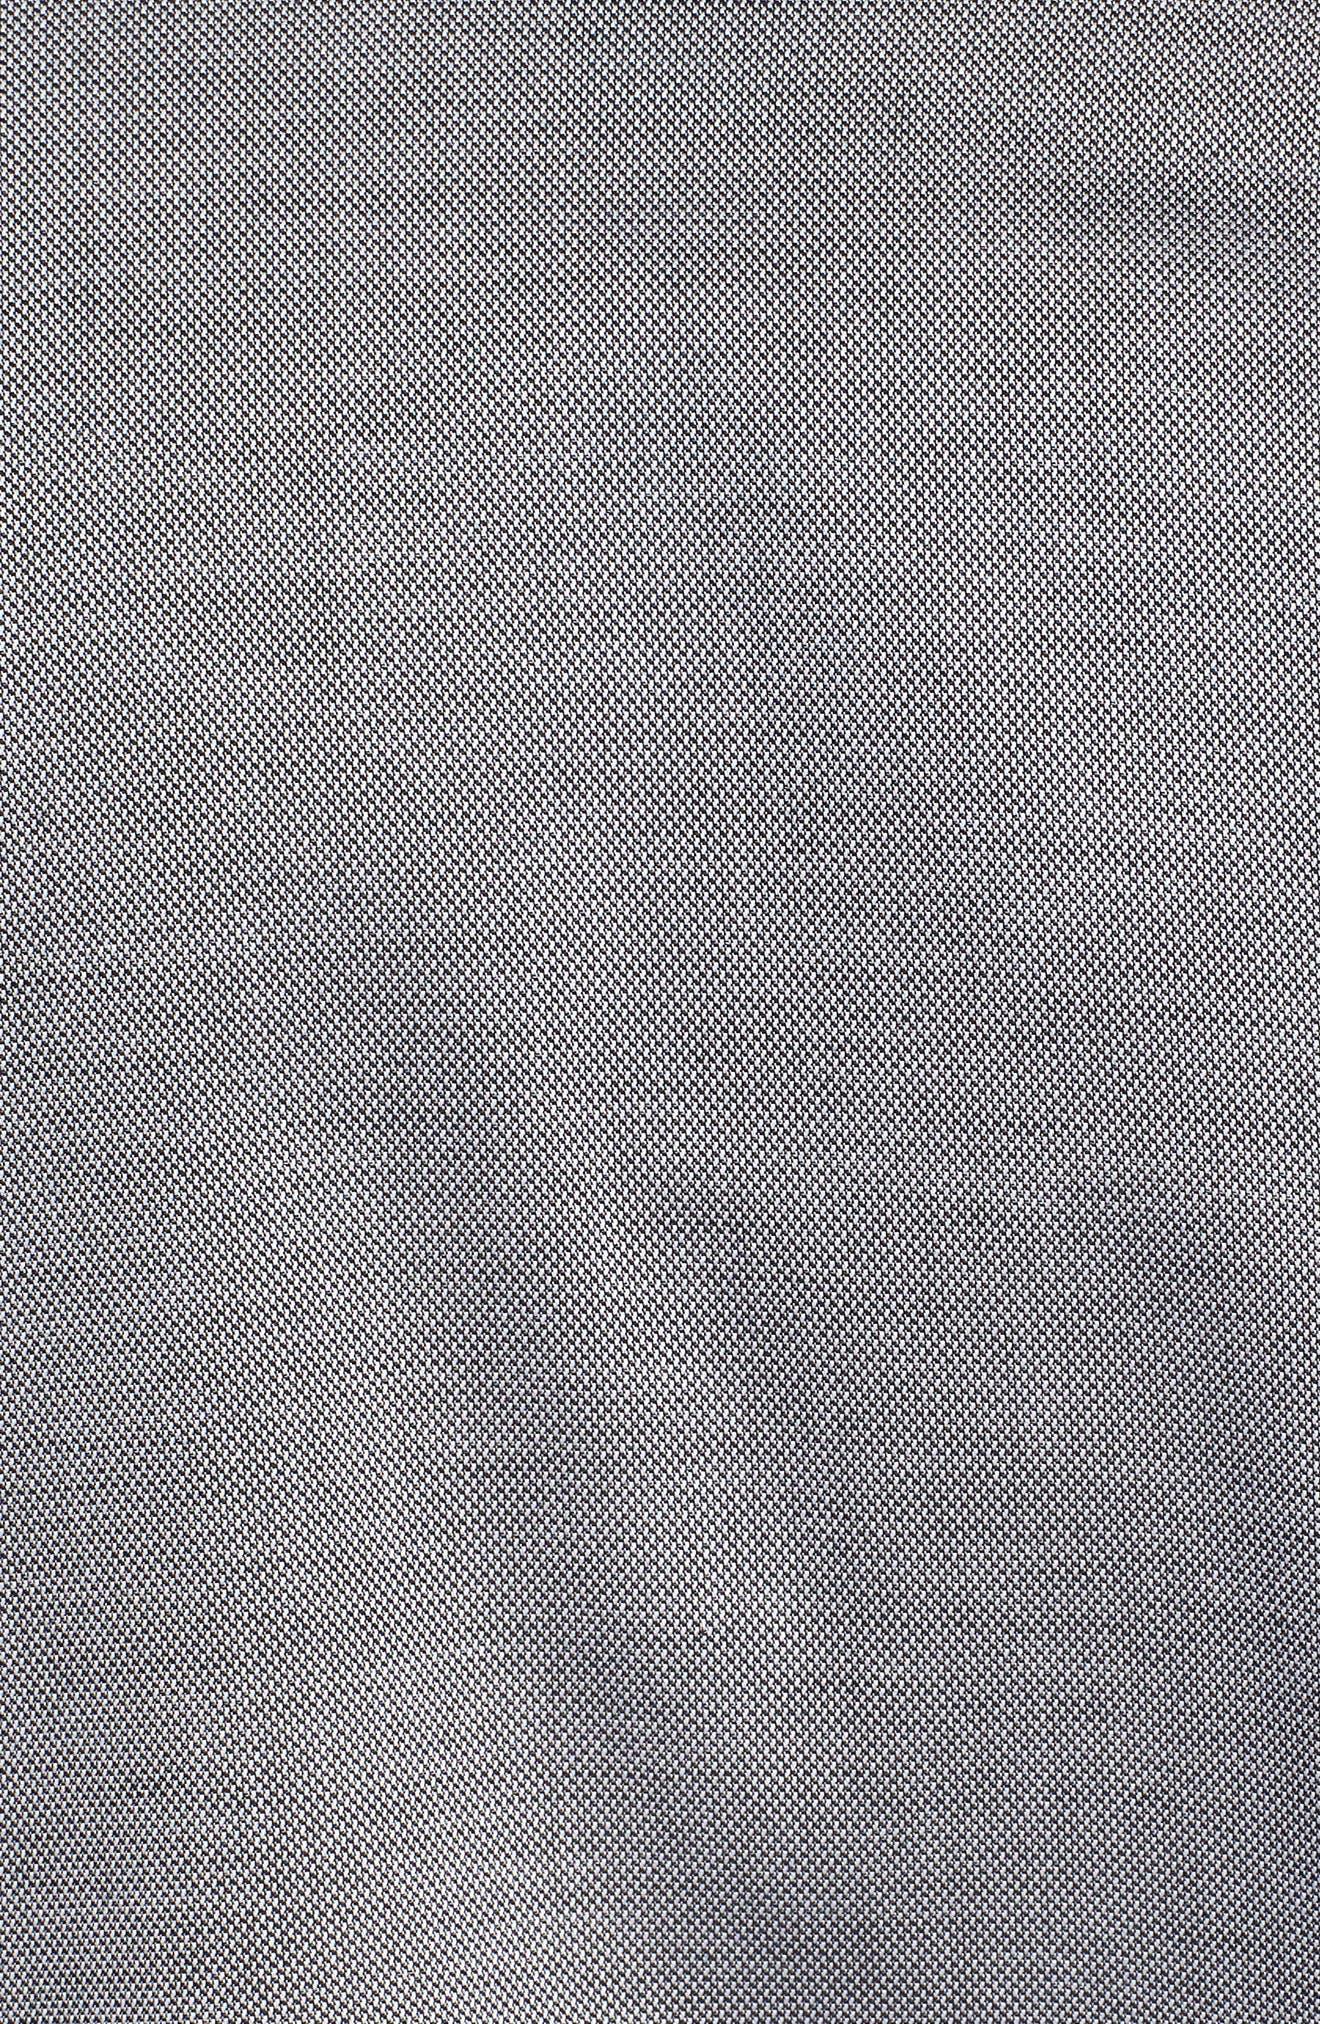 Pajama Top,                             Alternate thumbnail 6, color,                             BLACK ROYAL OXFORD